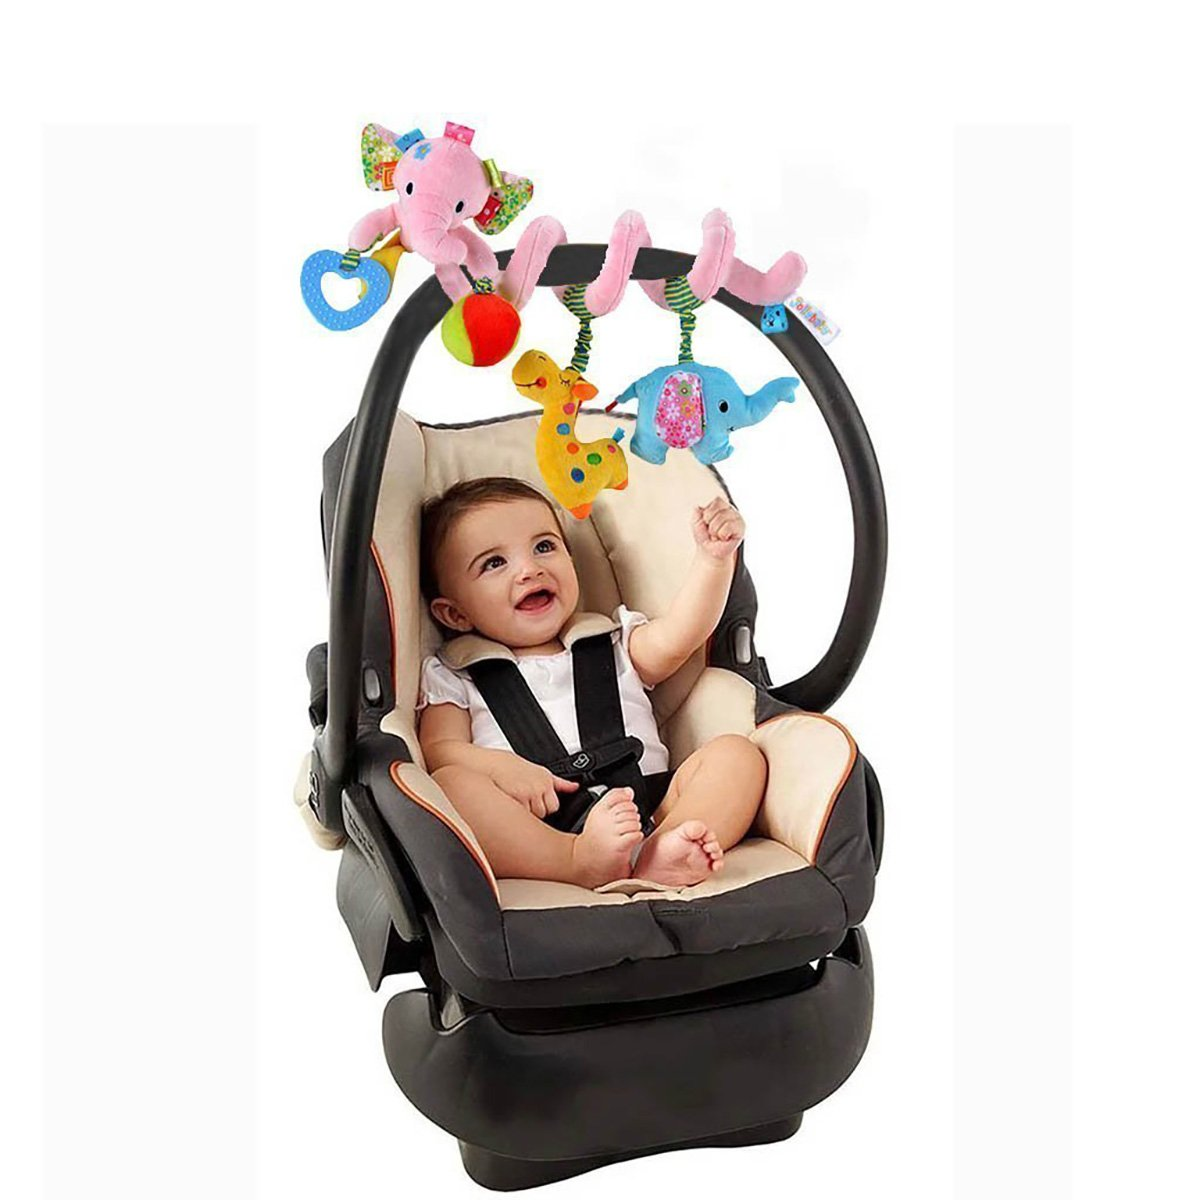 Hosim Cute Deer Design Infant Baby Around Crib Mobile Spiral Bed Bar Developmental Plush Animal Soft Toy Kids Stroller and Travel Activity Toy with Safety Mirror